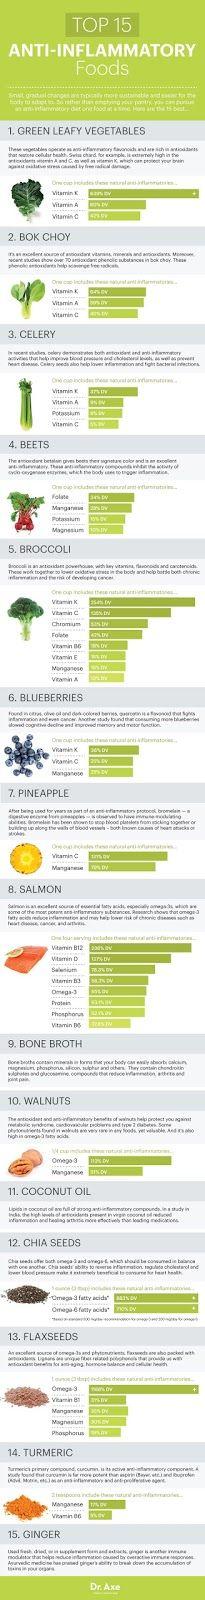 Skinny Diva Diet: Top 15 Anti-Inflammatory Foods [Infographic]